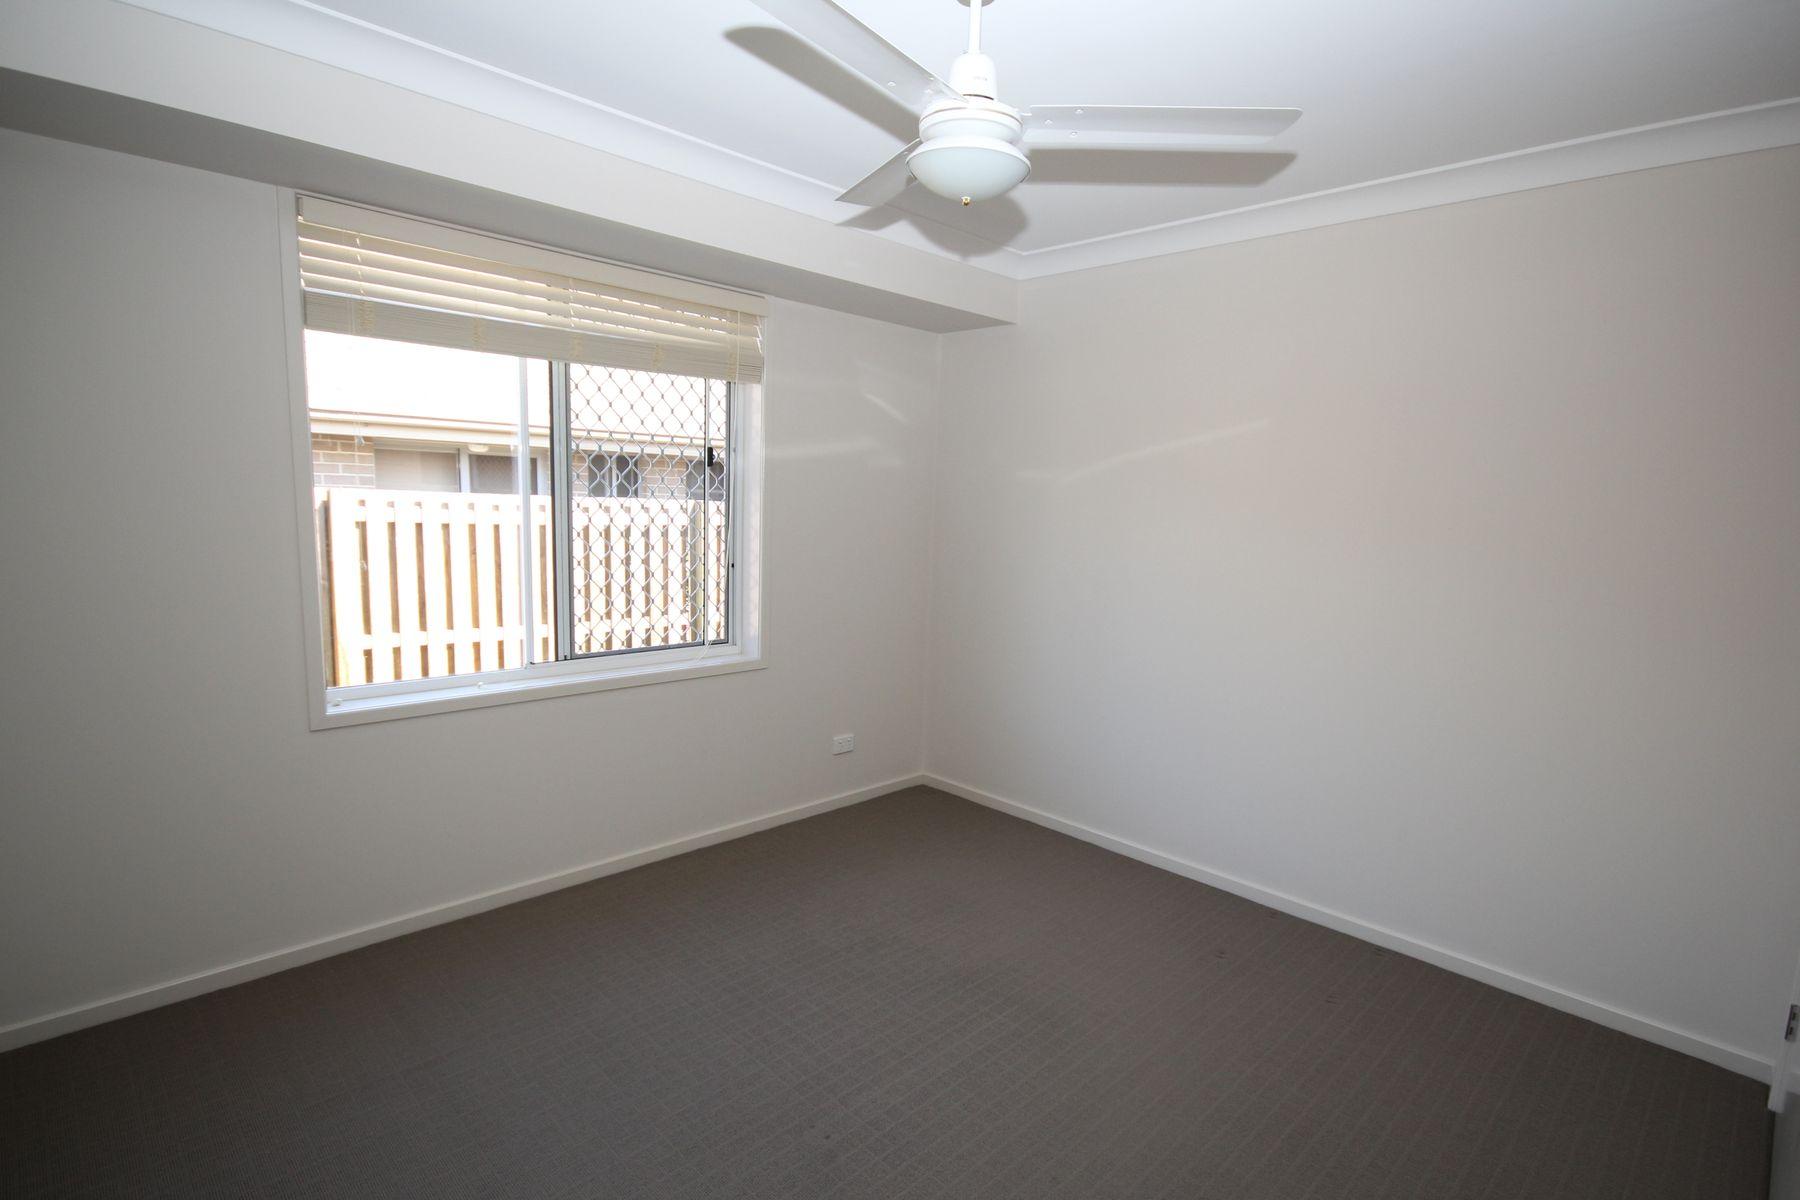 29 Benezet Drive, Augustine Heights, QLD 4300